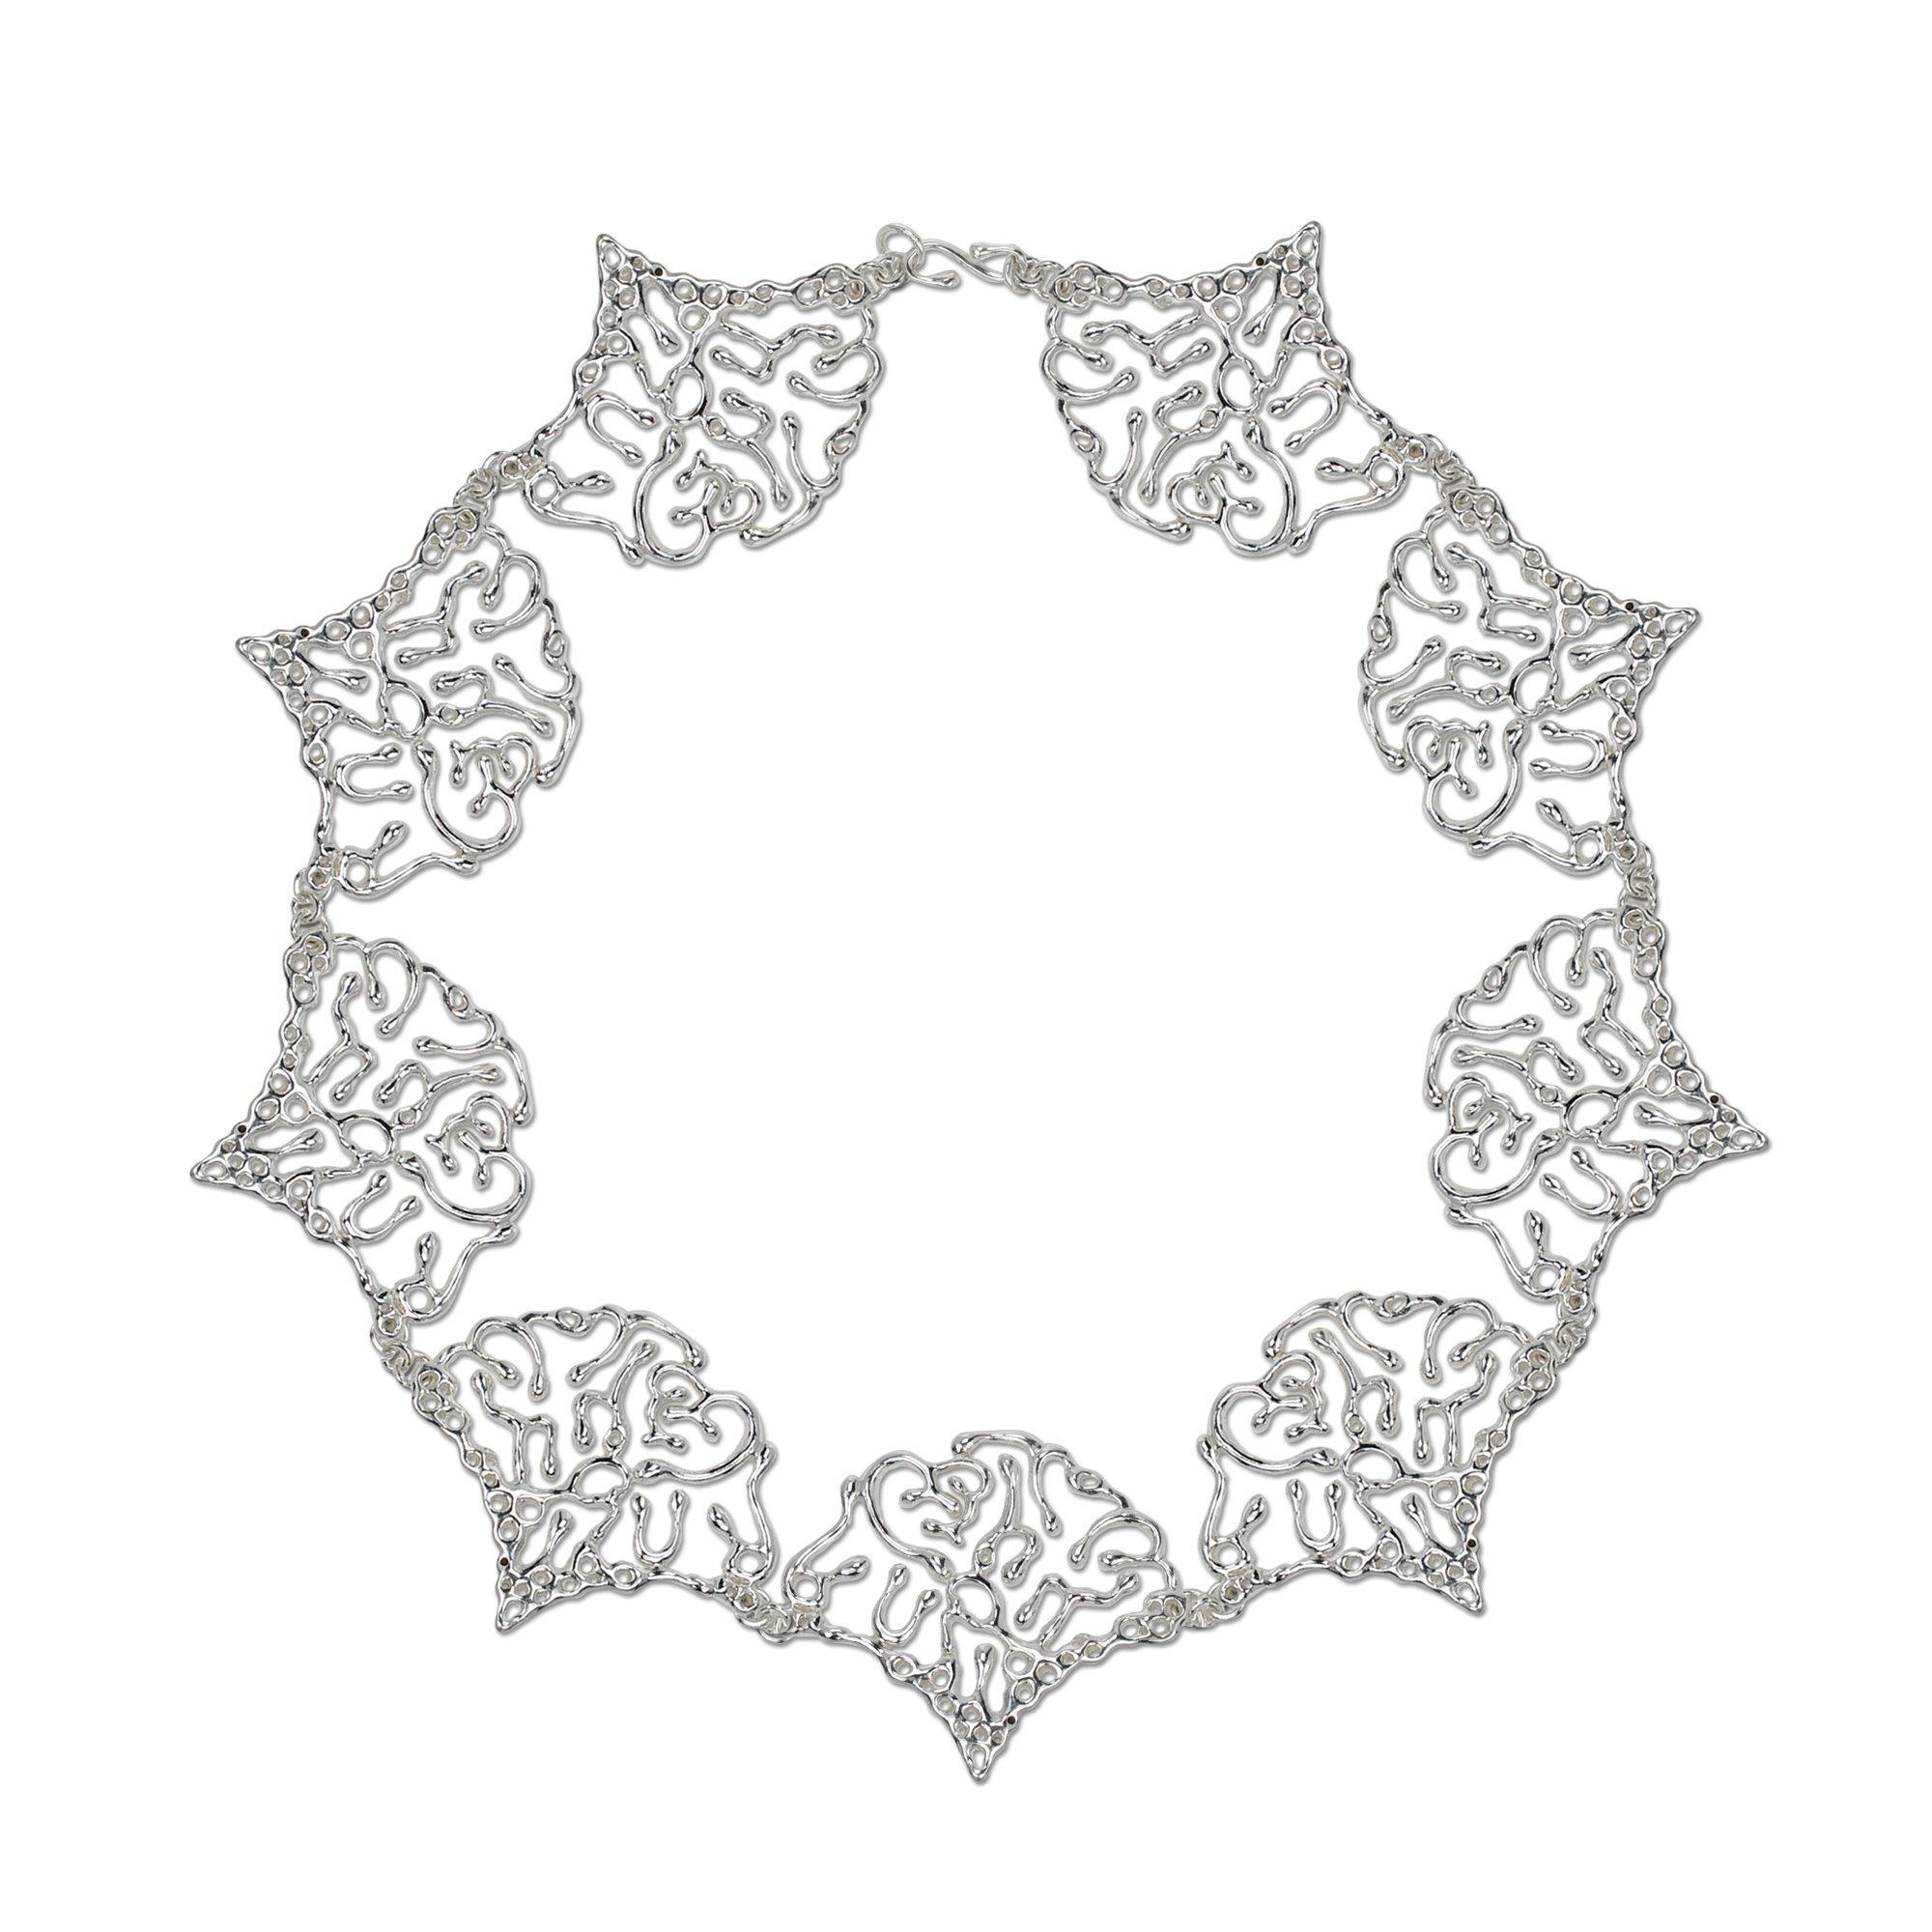 Ginkgo Biloba Leaf Necklace By Chiachien Tsai Silver